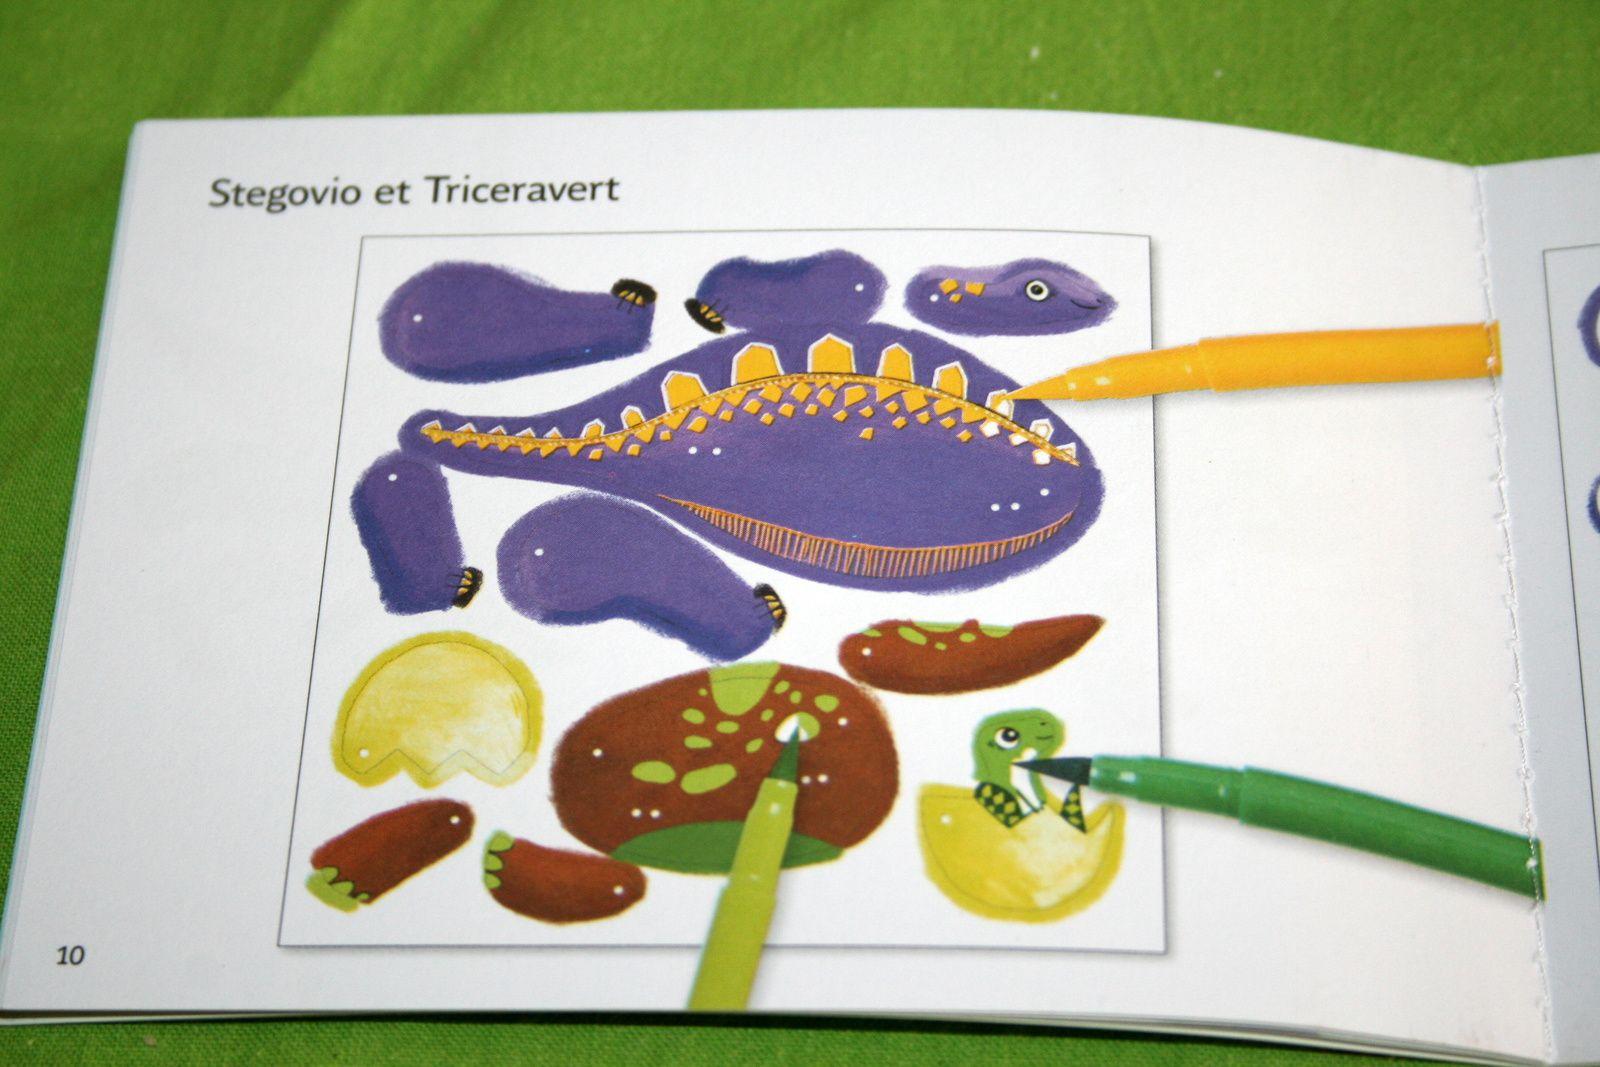 #dinosaure #marionnette #pantin #djeco #charlotteblabla blog